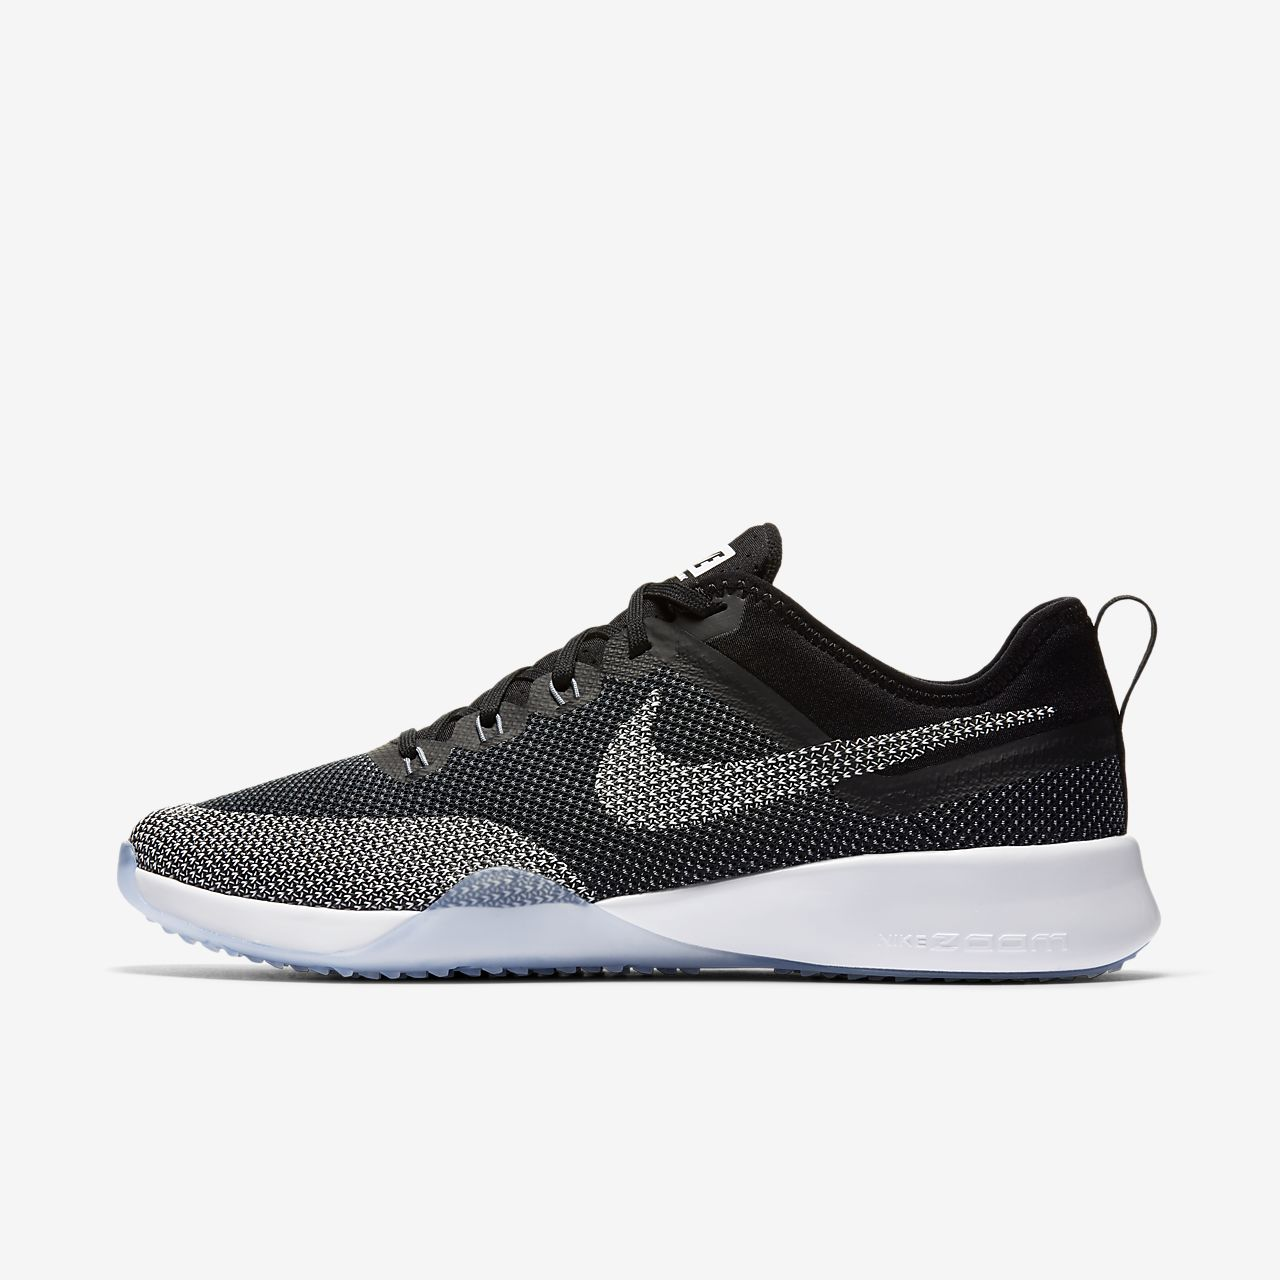 9e894c3f39d Nike Air Zoom Dynamic TR Women s Training Shoe. Nike.com IE